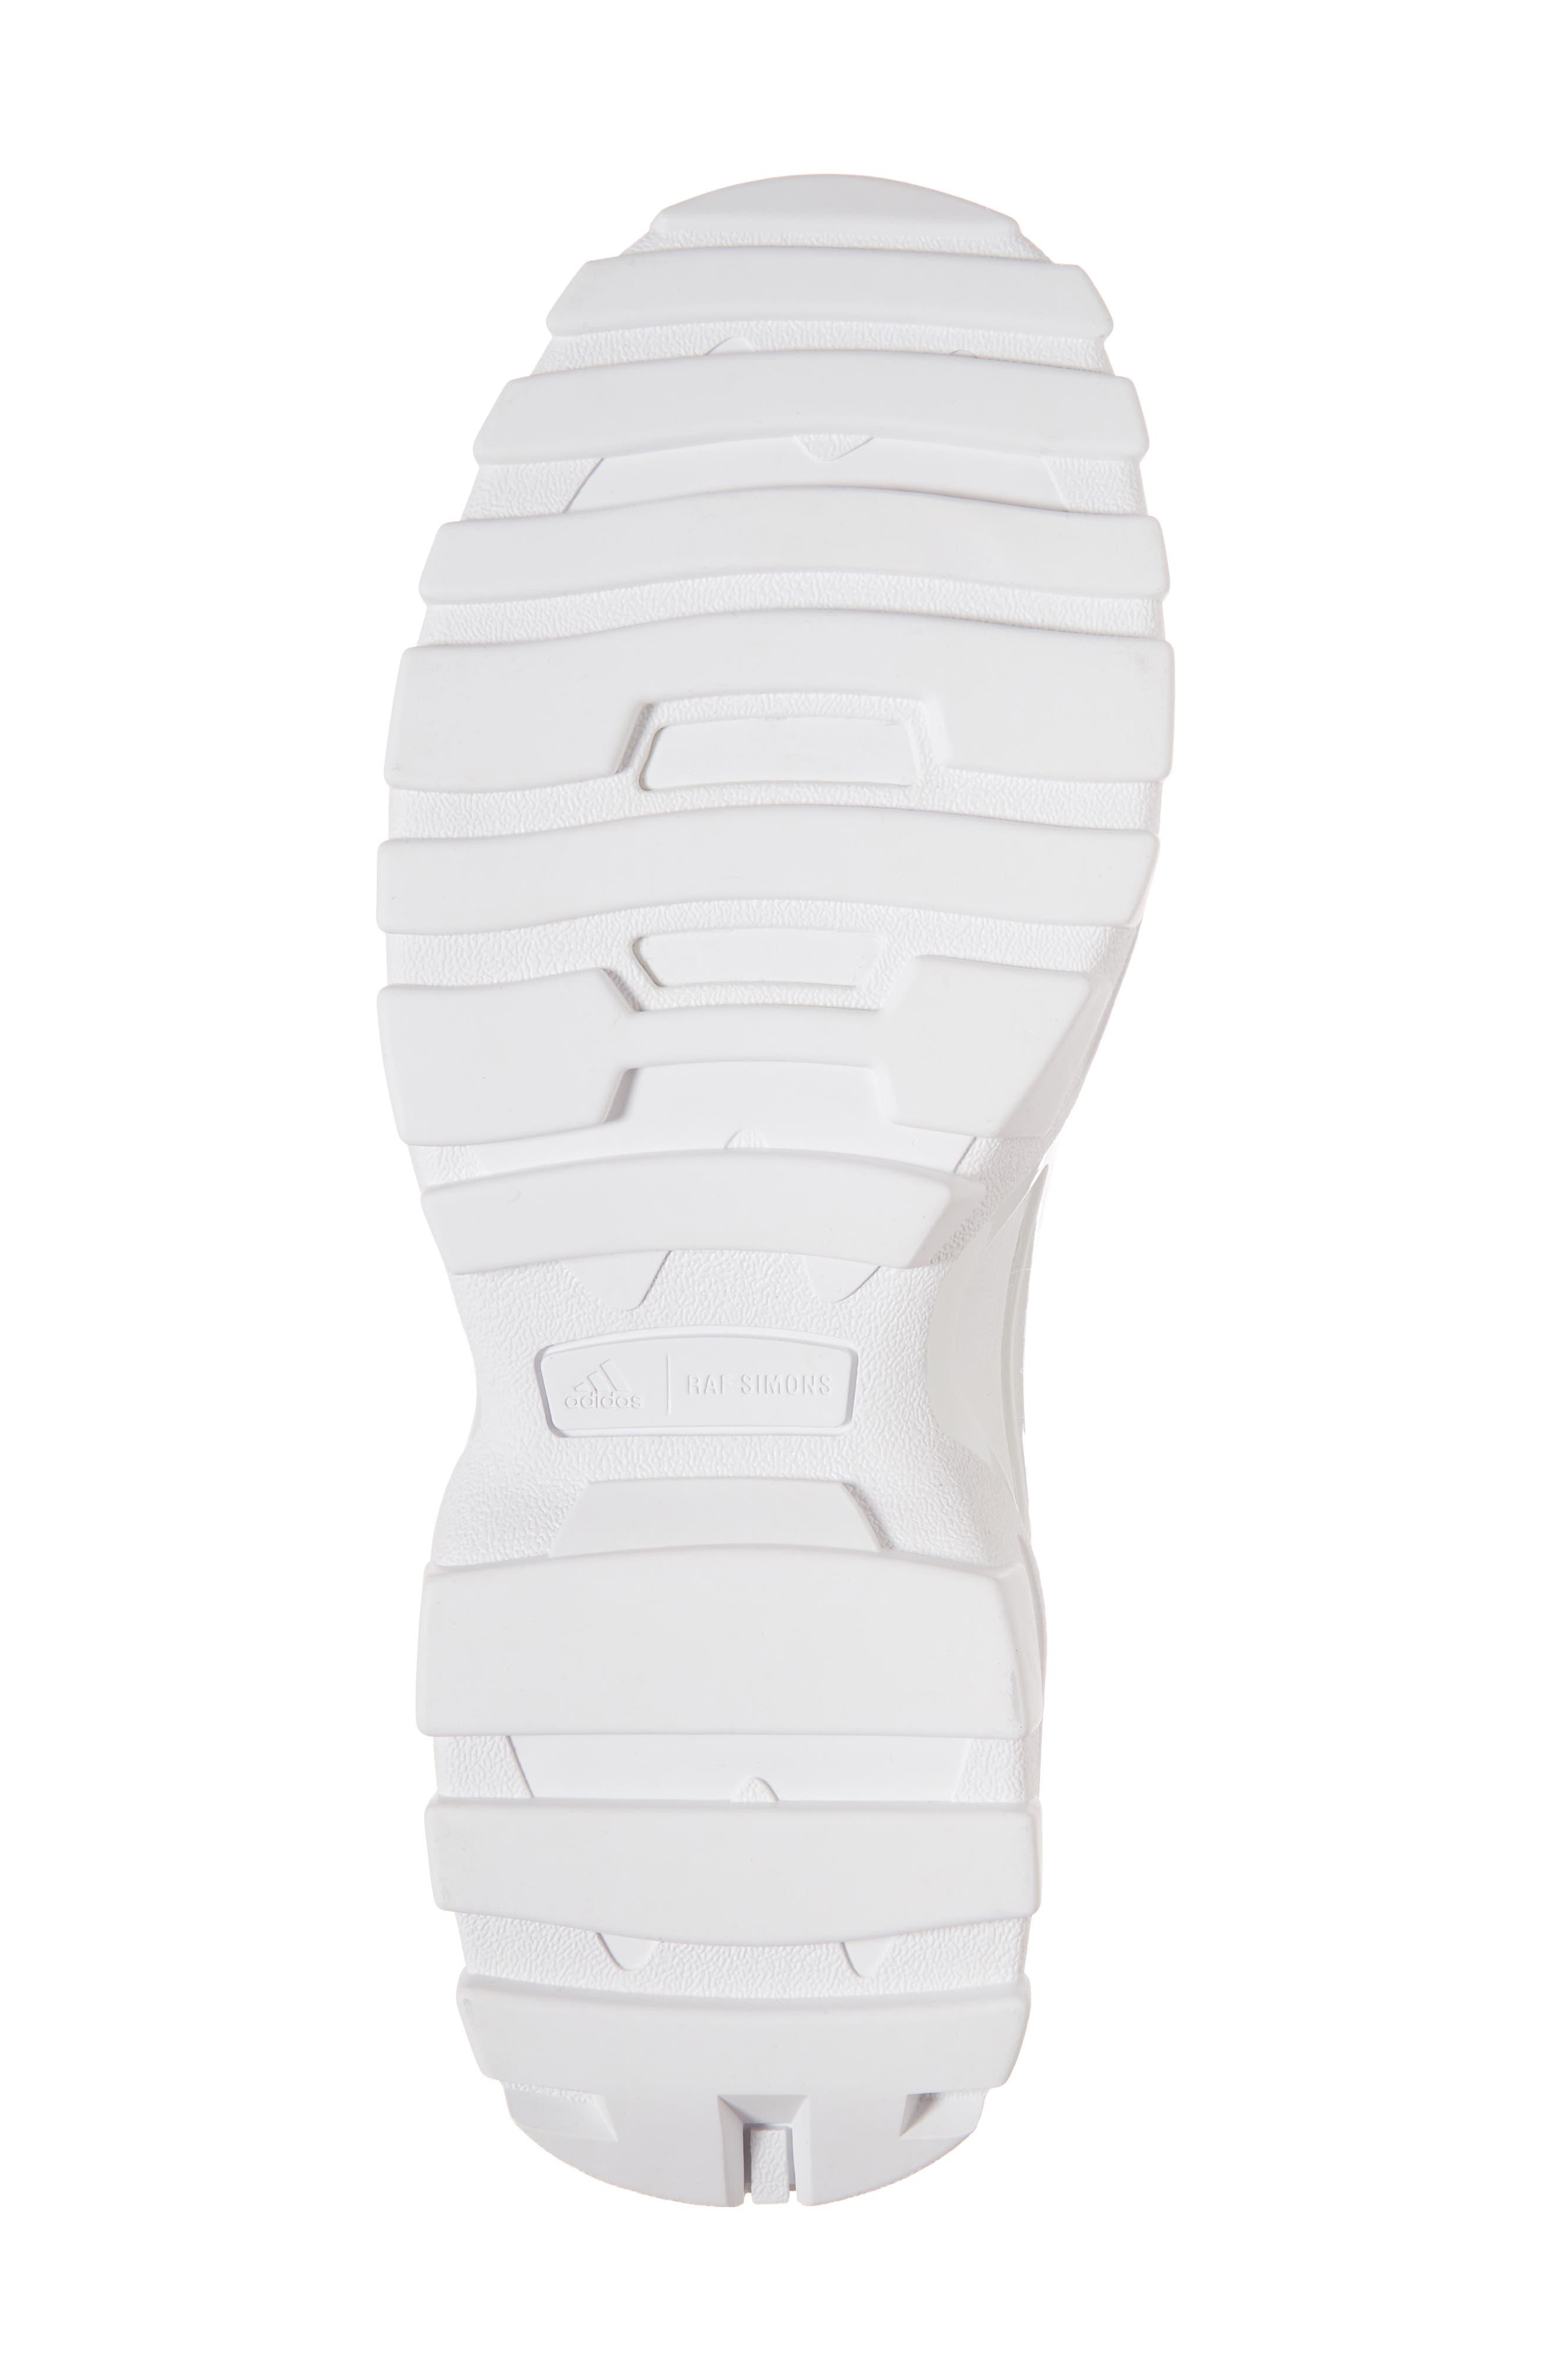 Detroit Low Top Sneaker,                             Alternate thumbnail 6, color,                             Beige/ White